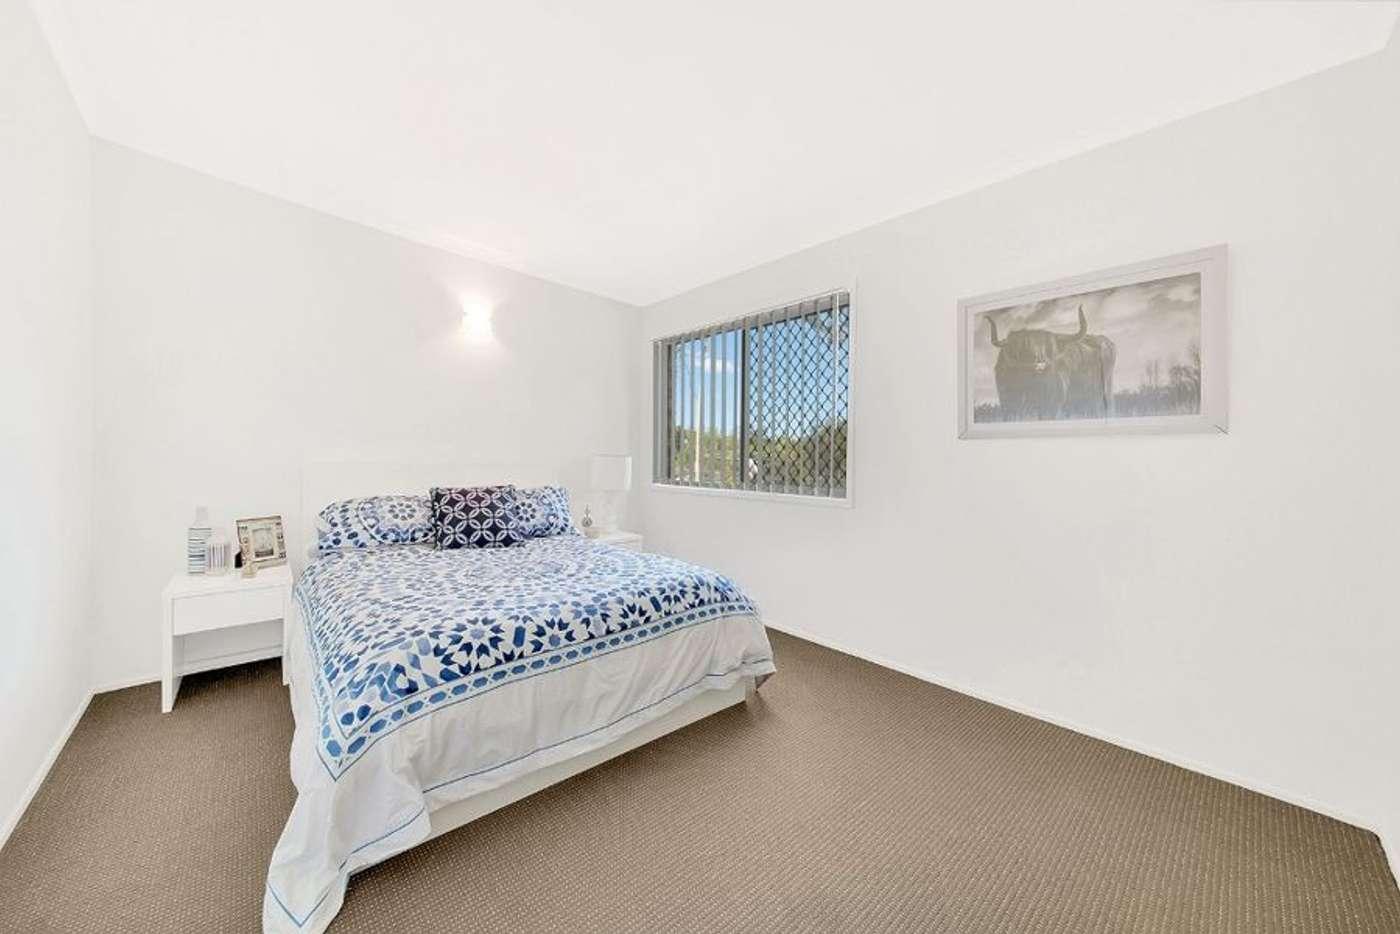 Sixth view of Homely house listing, 120 Malpas Street, Boyne Island QLD 4680